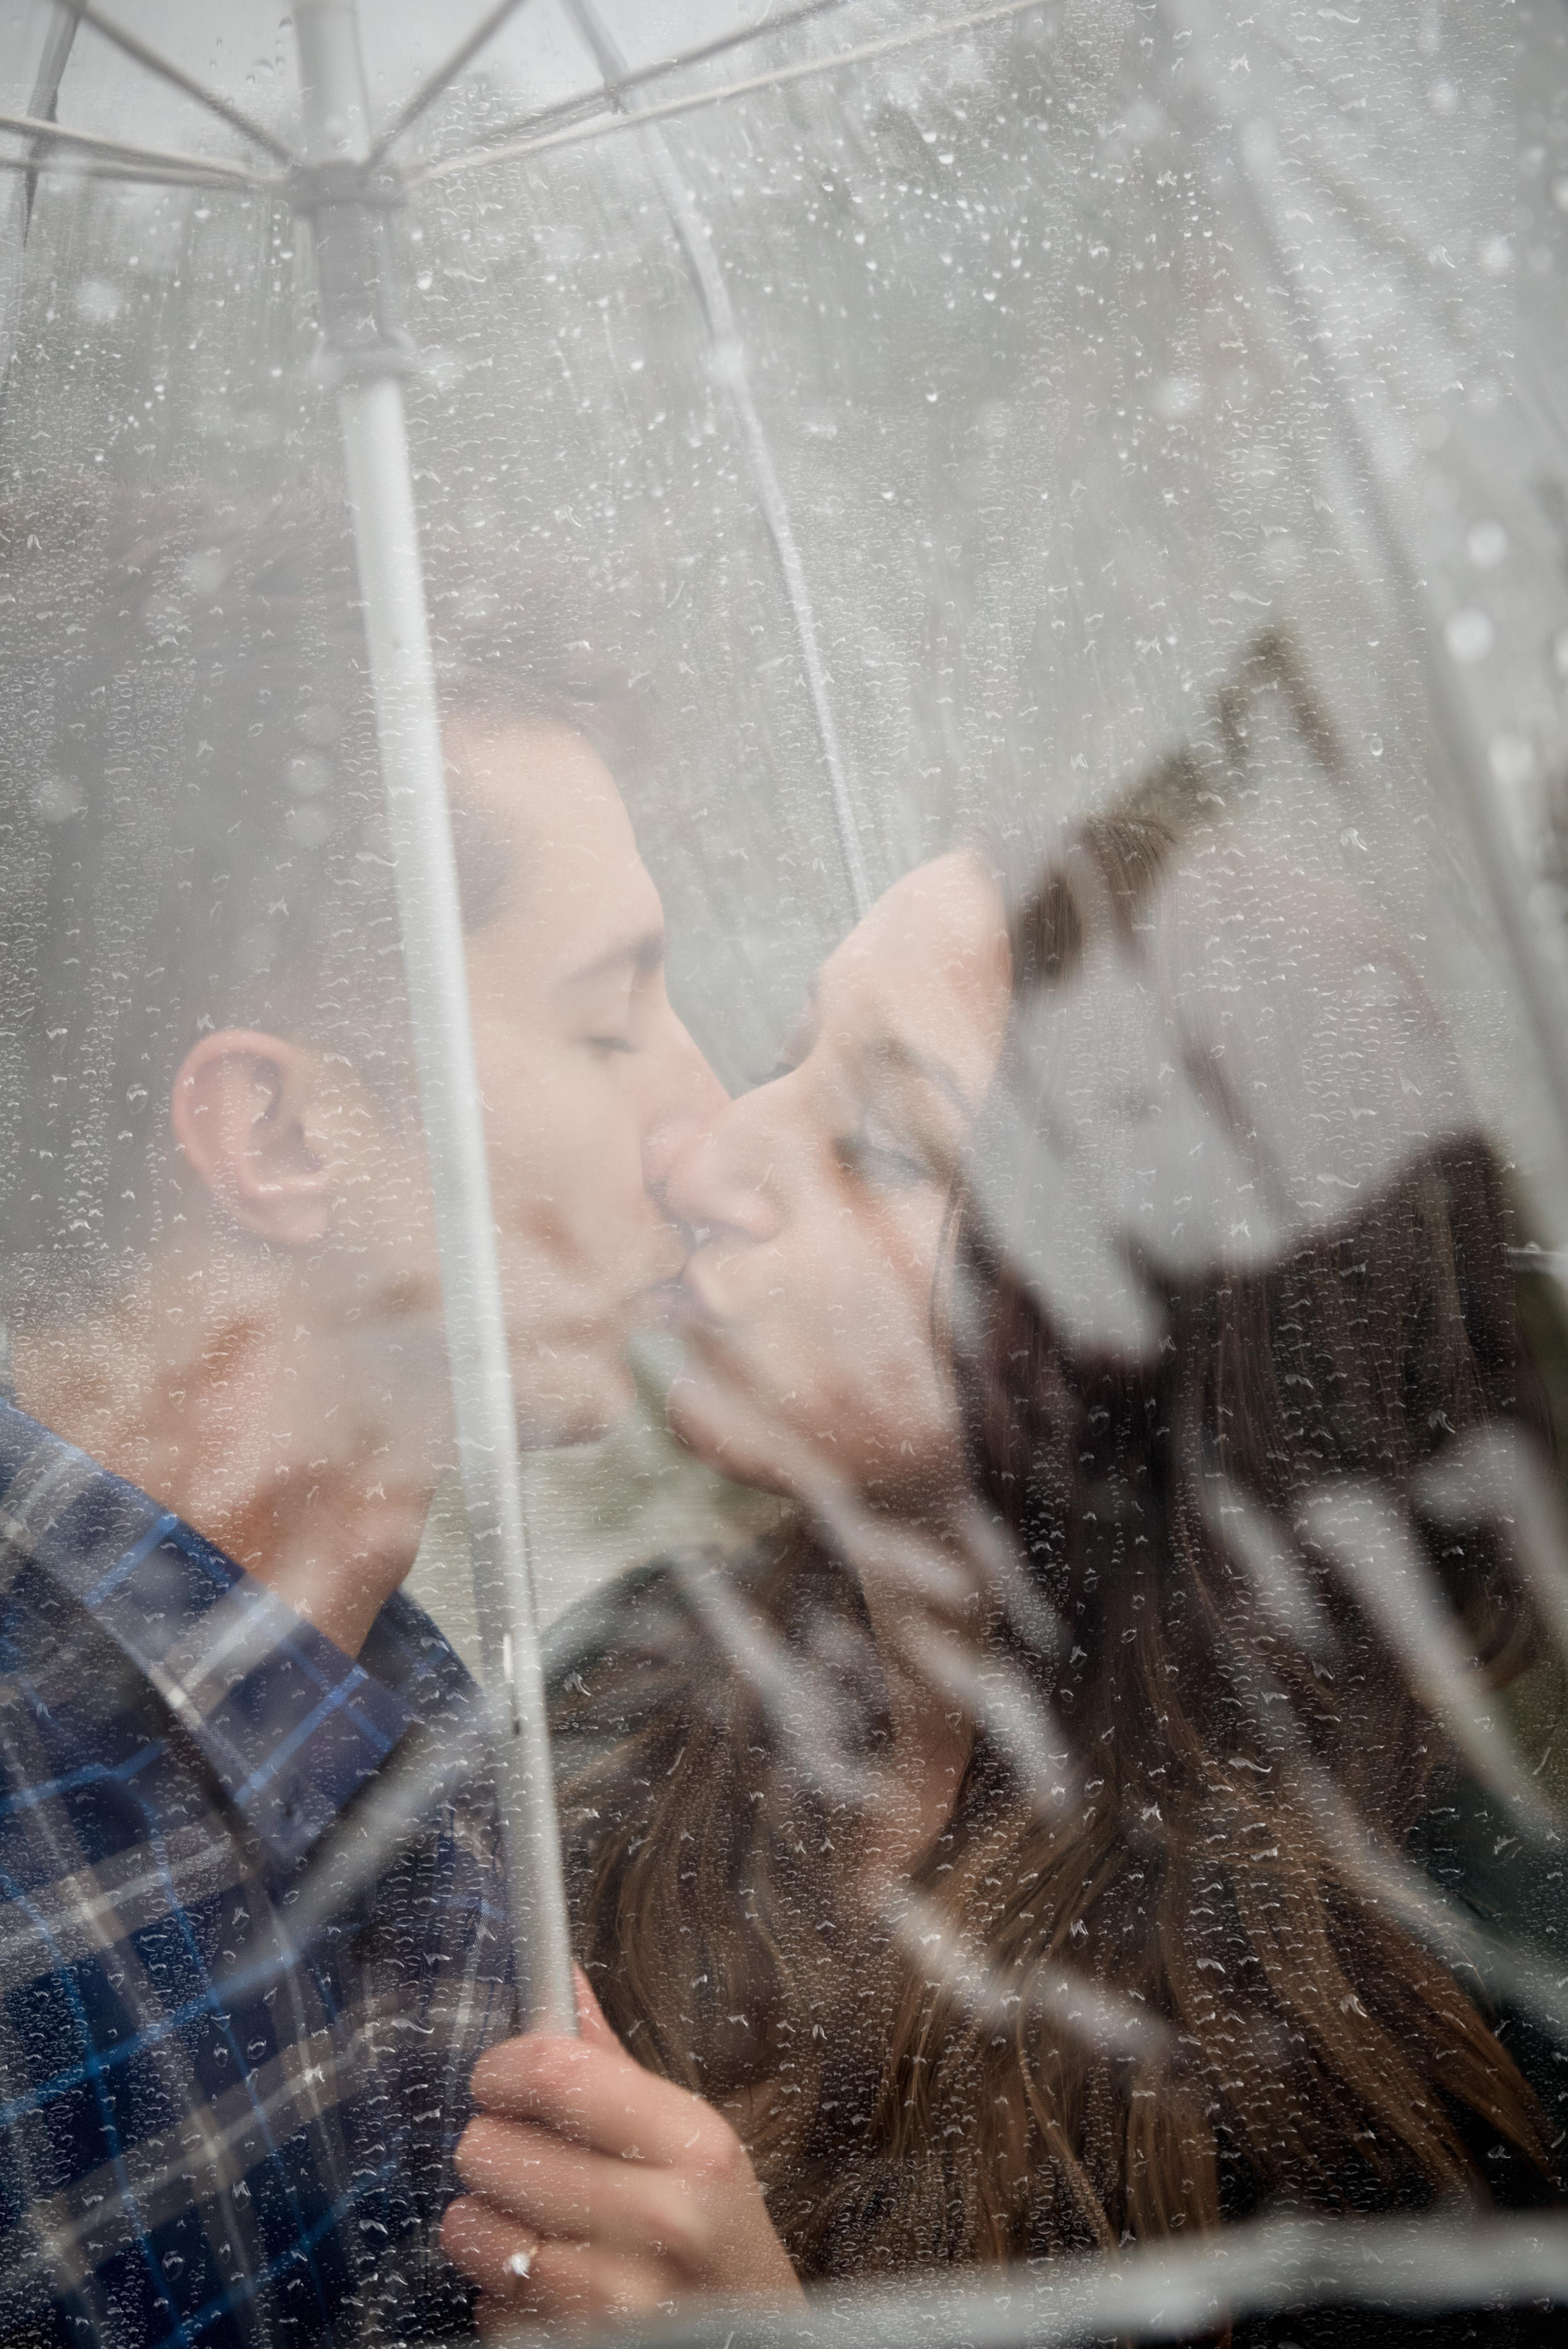 wet rainy day engagement photography in Athens, Ohio